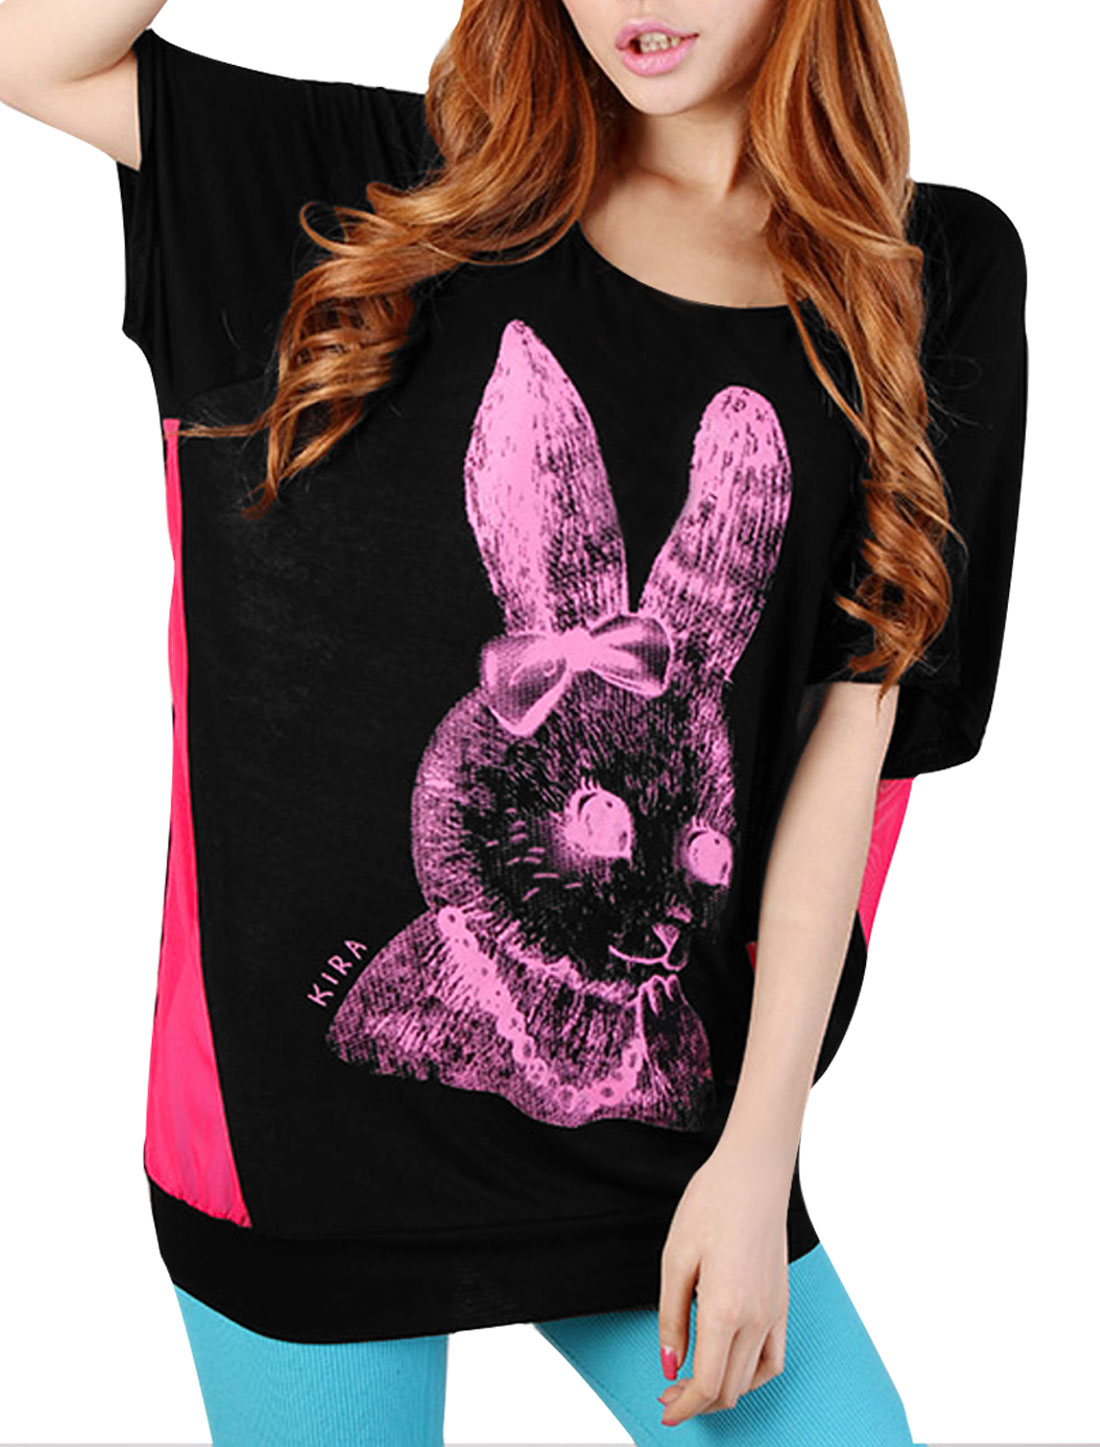 Woman Cartoon Rabbit Pattern Design Contrast Color Fuchsia Black Top Shirt M